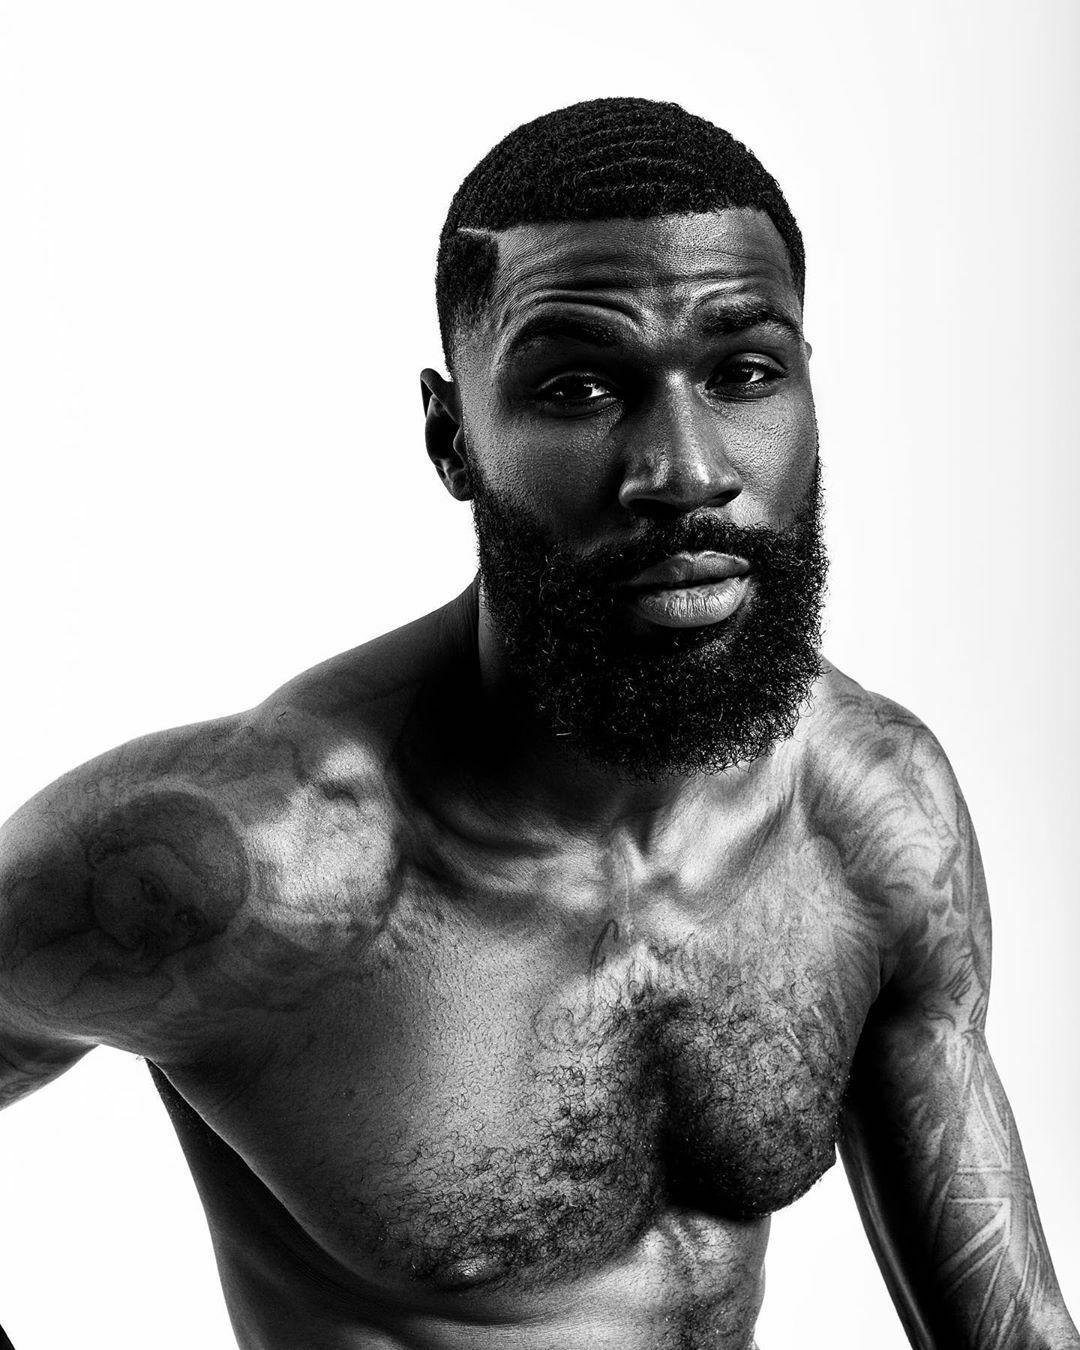 Man in nigeria sexiest Top 10